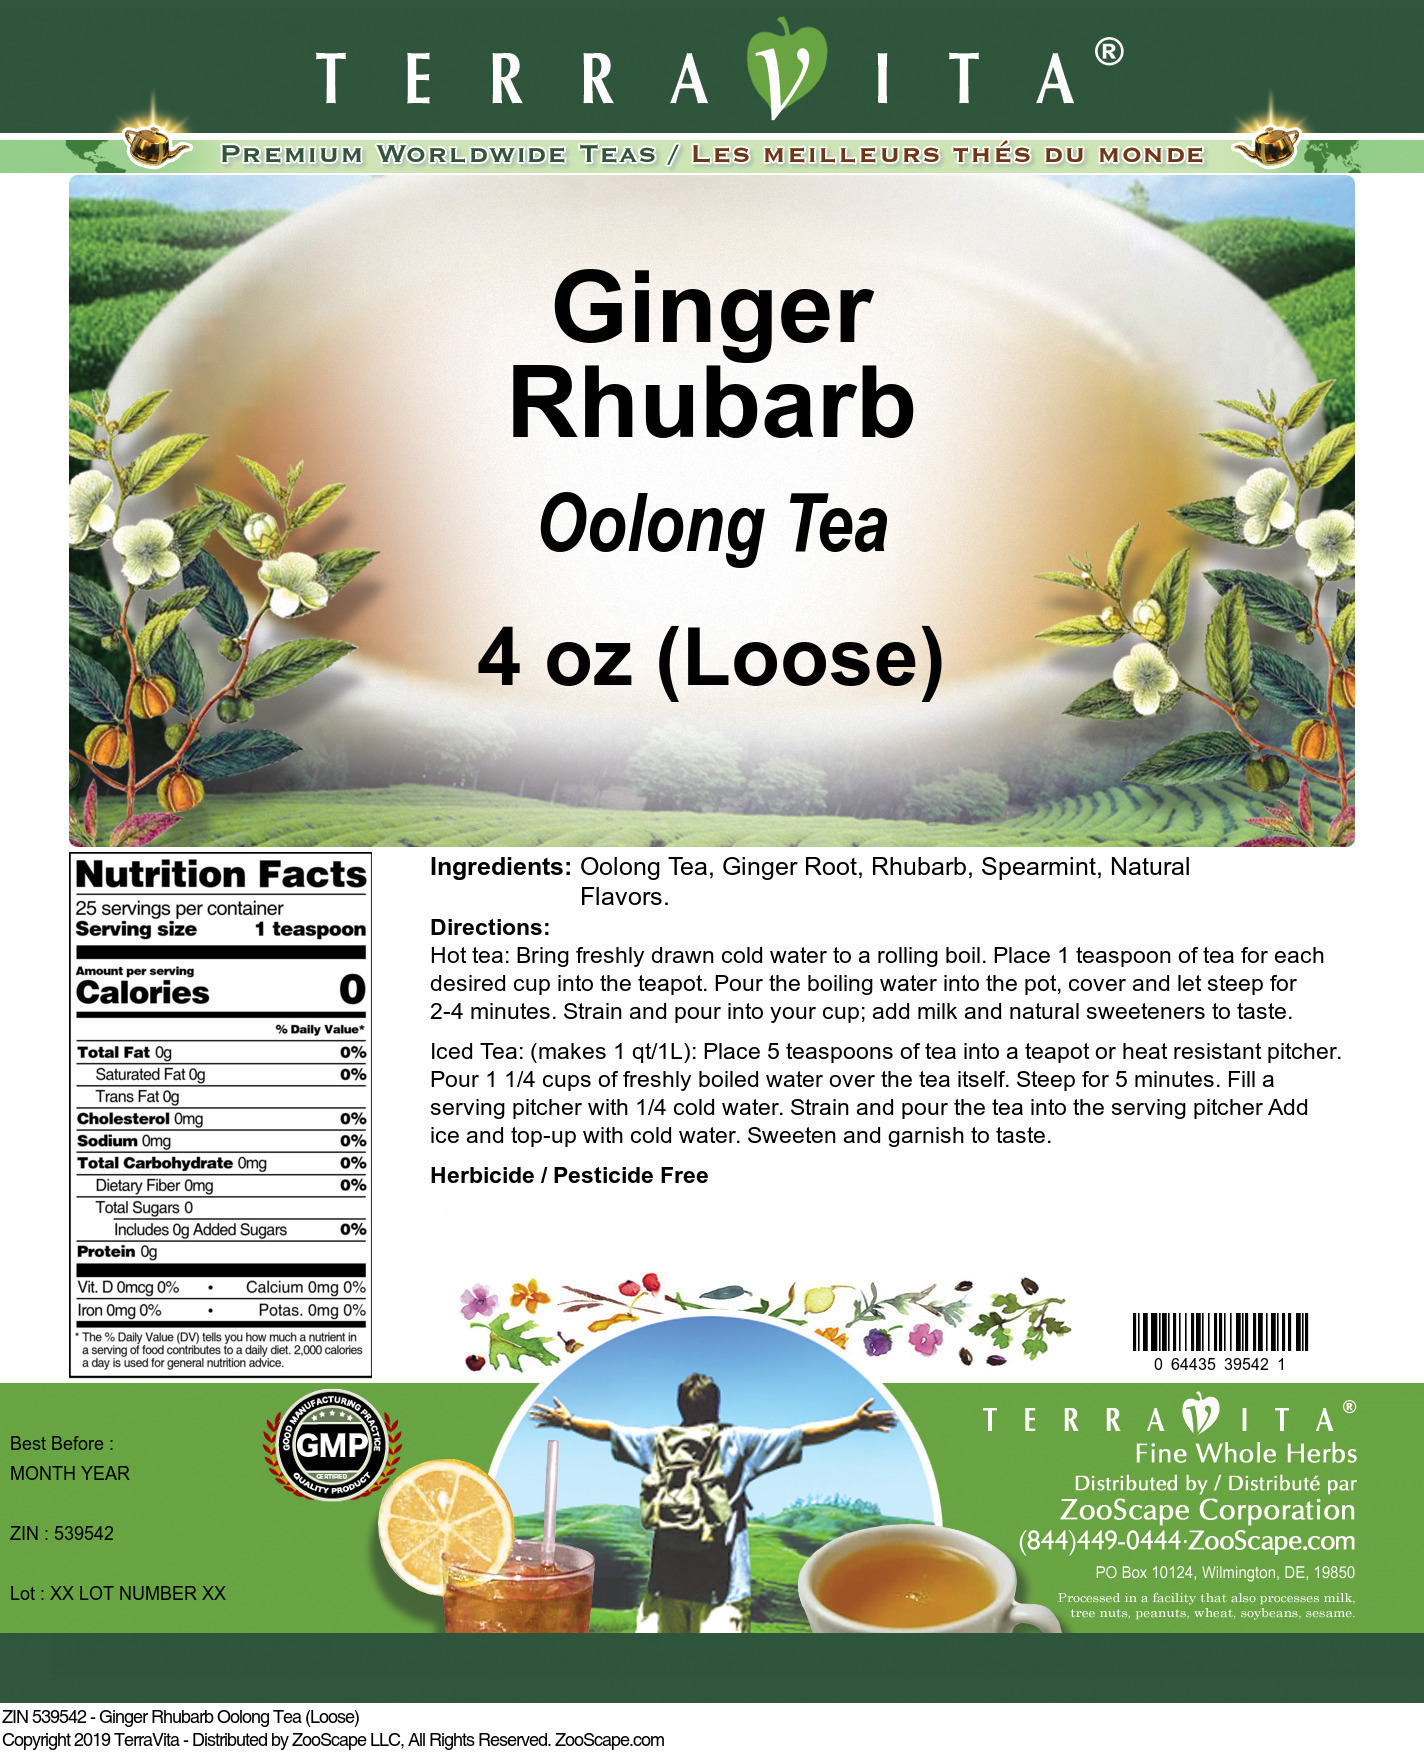 Ginger Rhubarb Oolong Tea